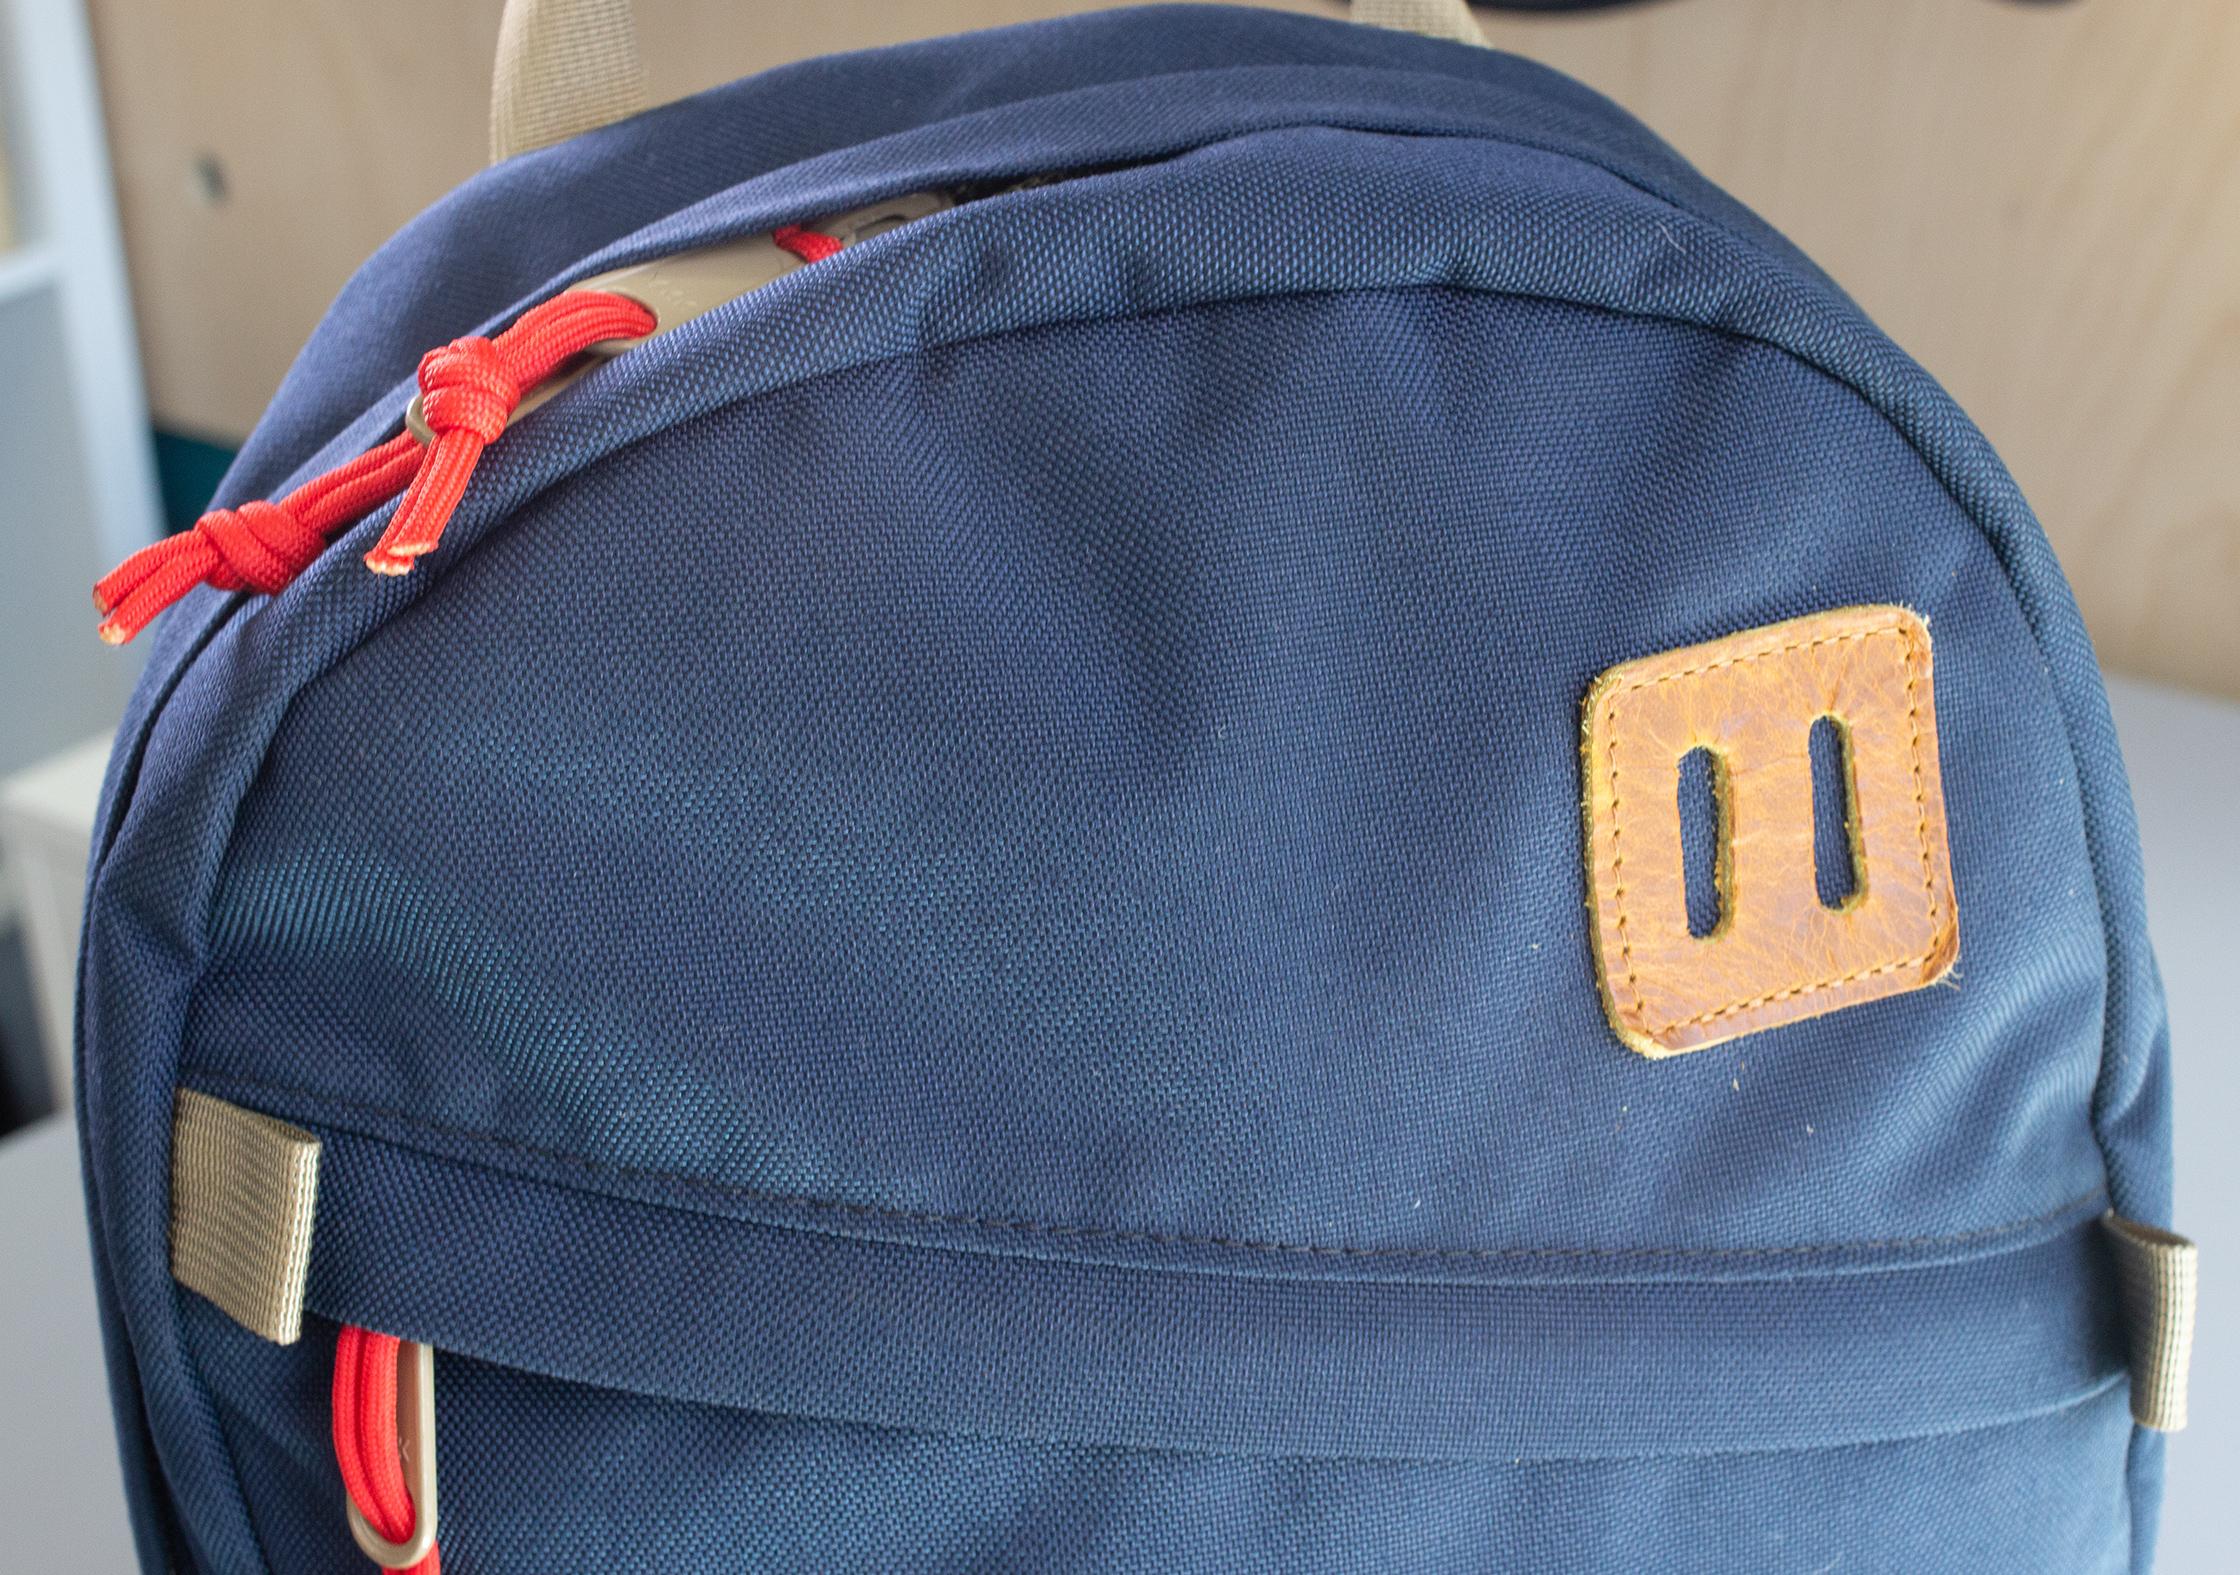 Topo Designs Daypack Slash Pocket and Lash Tab